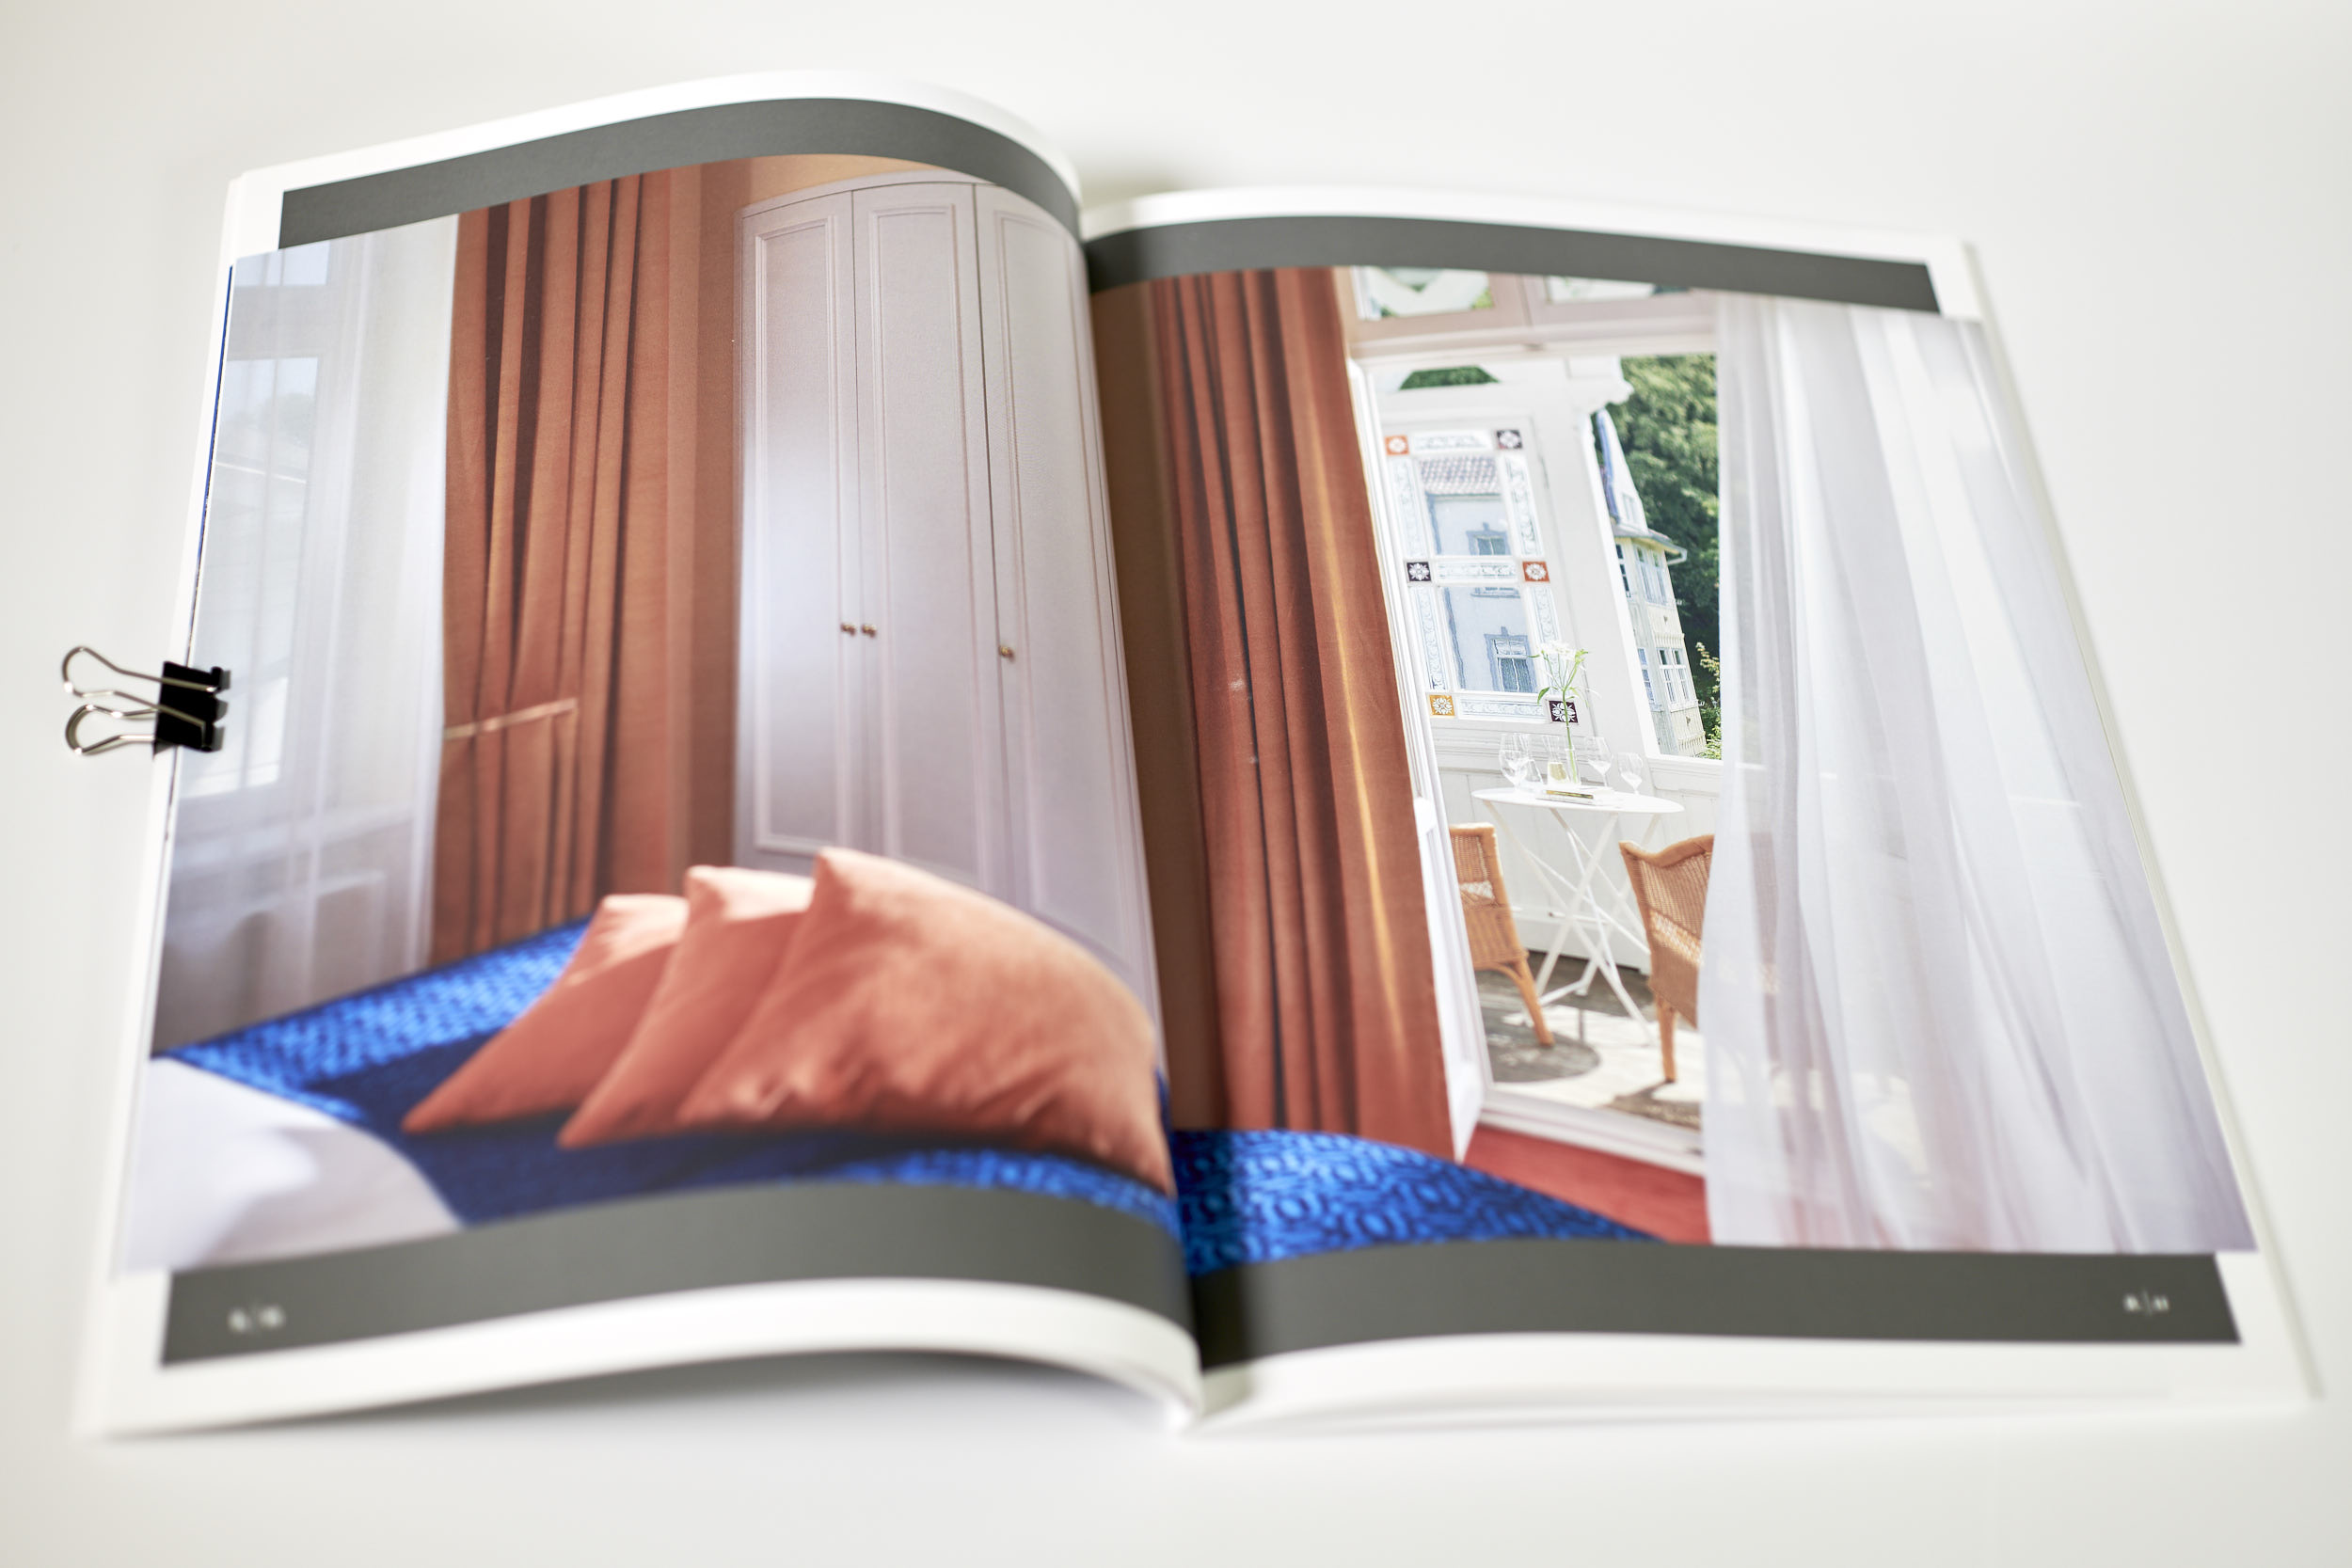 Grafikdesign-Pocha-Burwitz-Foto-Pocha-Burwitz 13